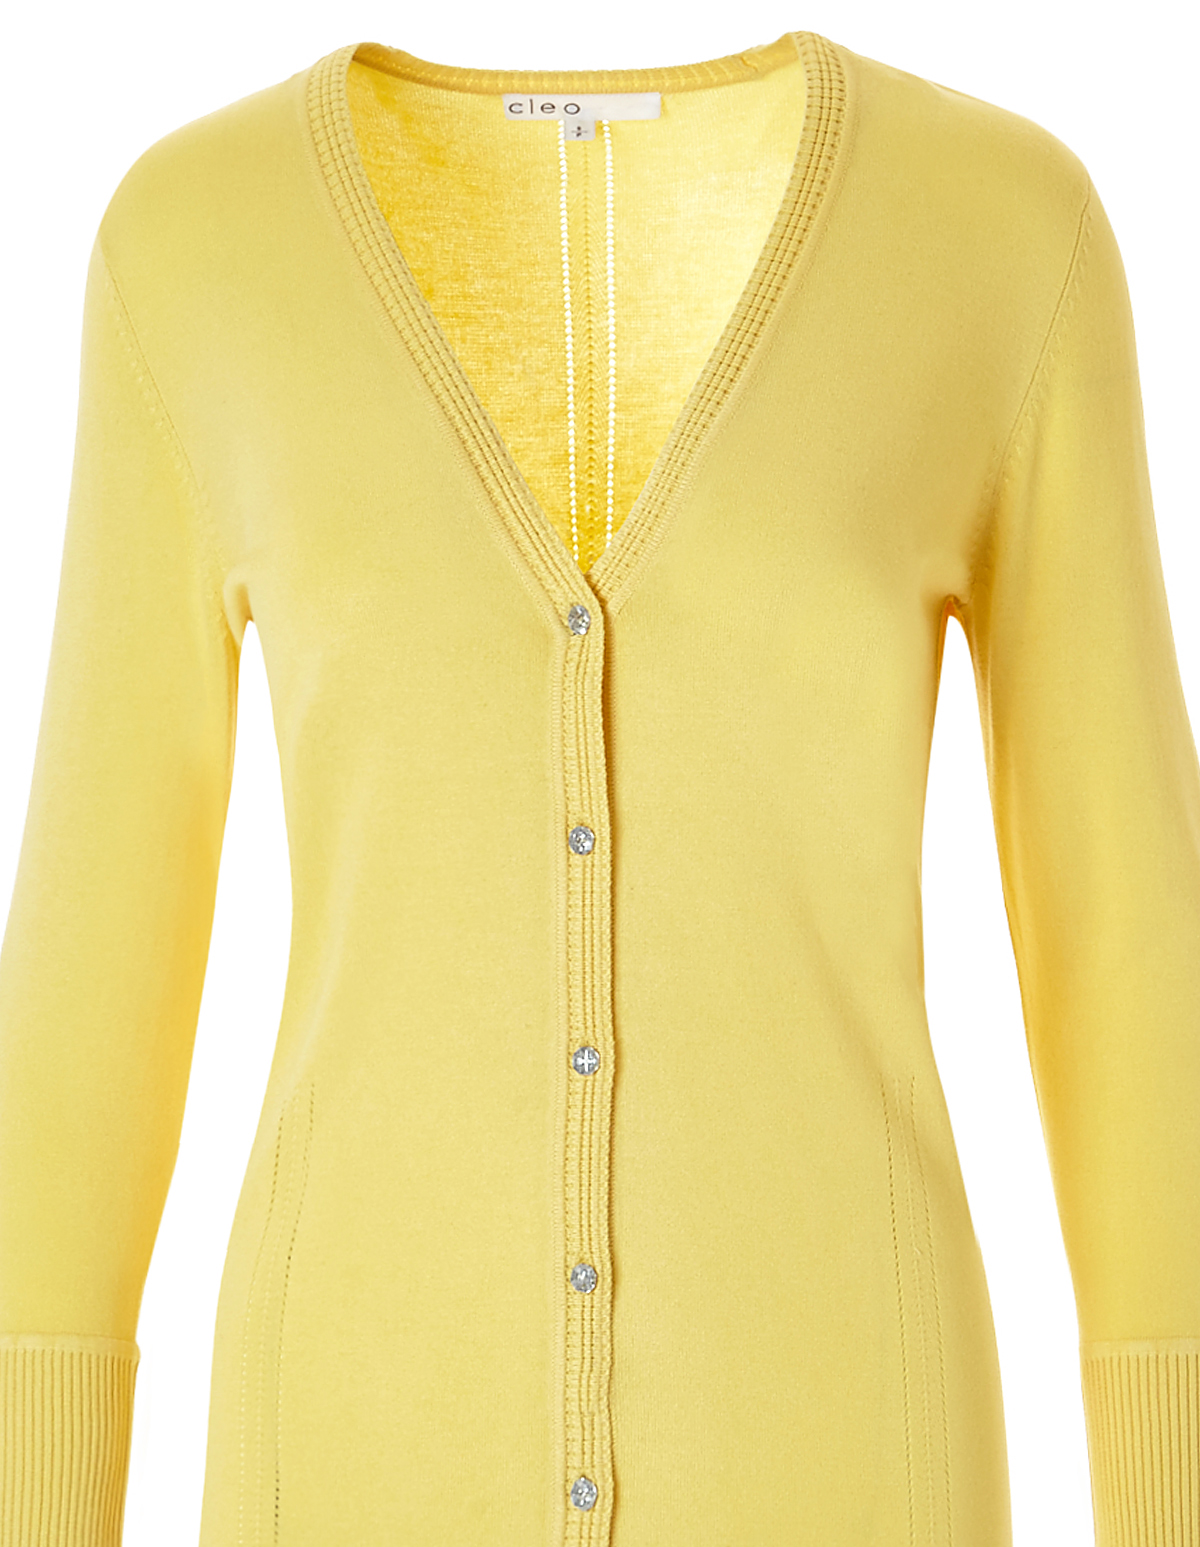 Yellow Cardigan Sweater | Cleo